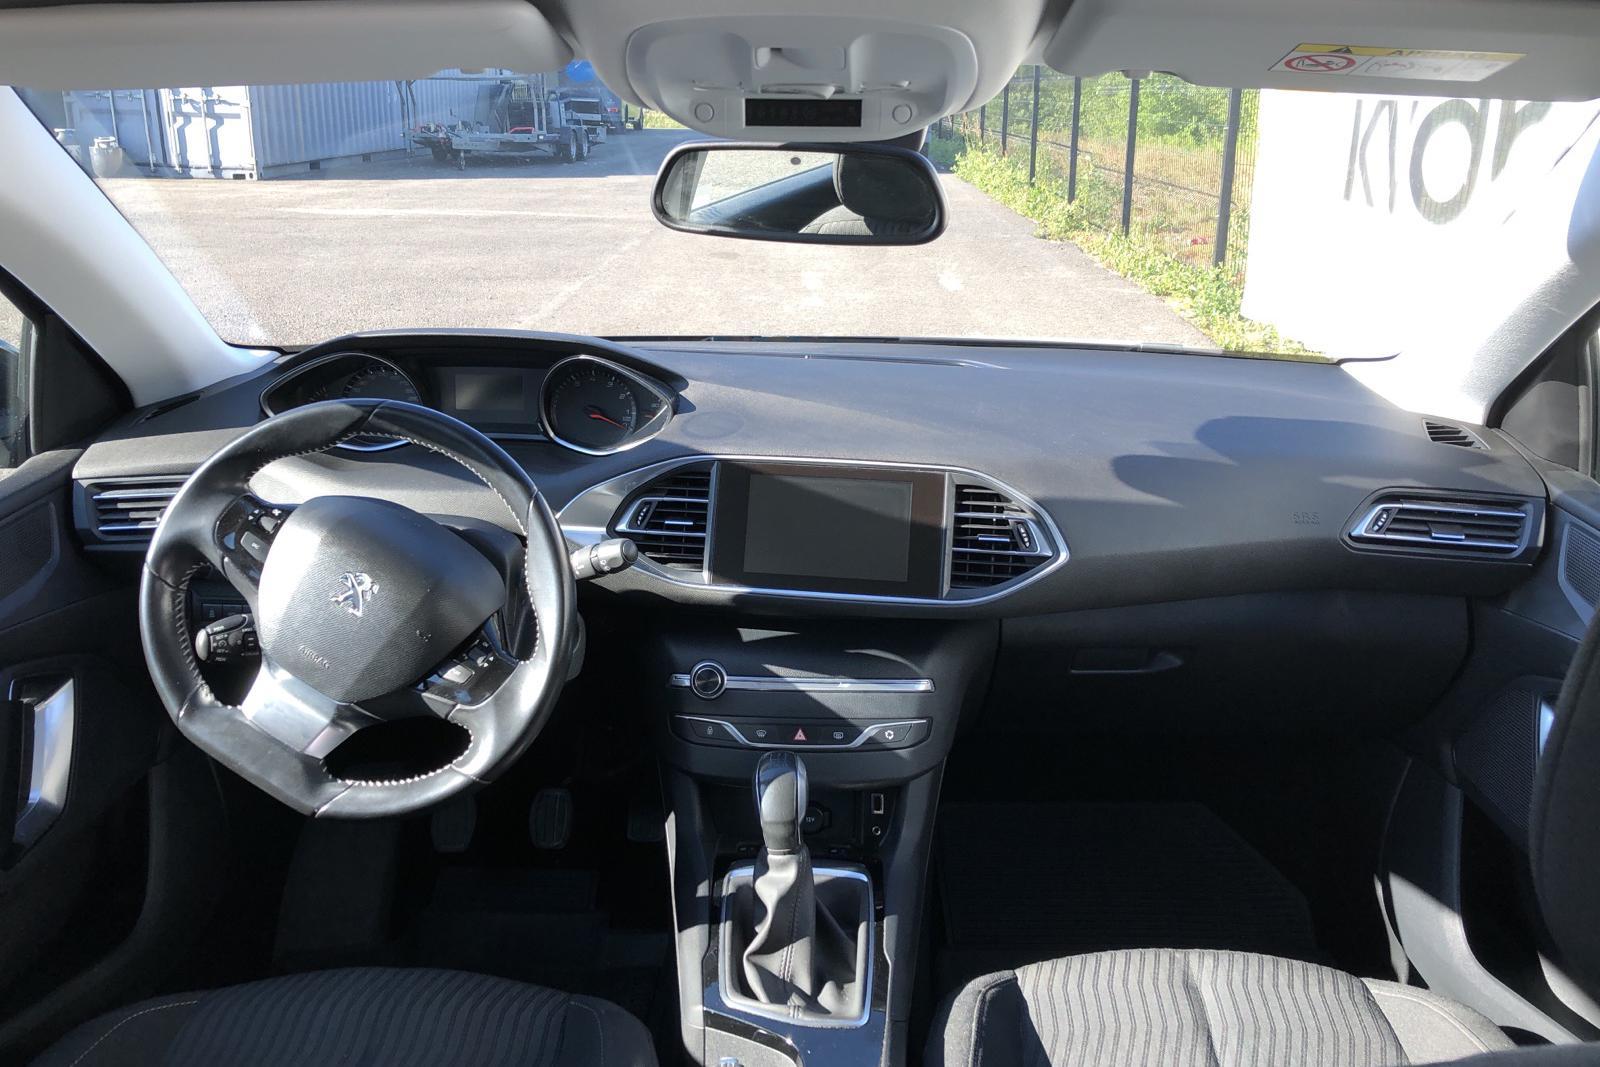 Peugeot 308 SW PureTech (110hk) - 9 781 mil - Manuell - Dark Grey - 2016